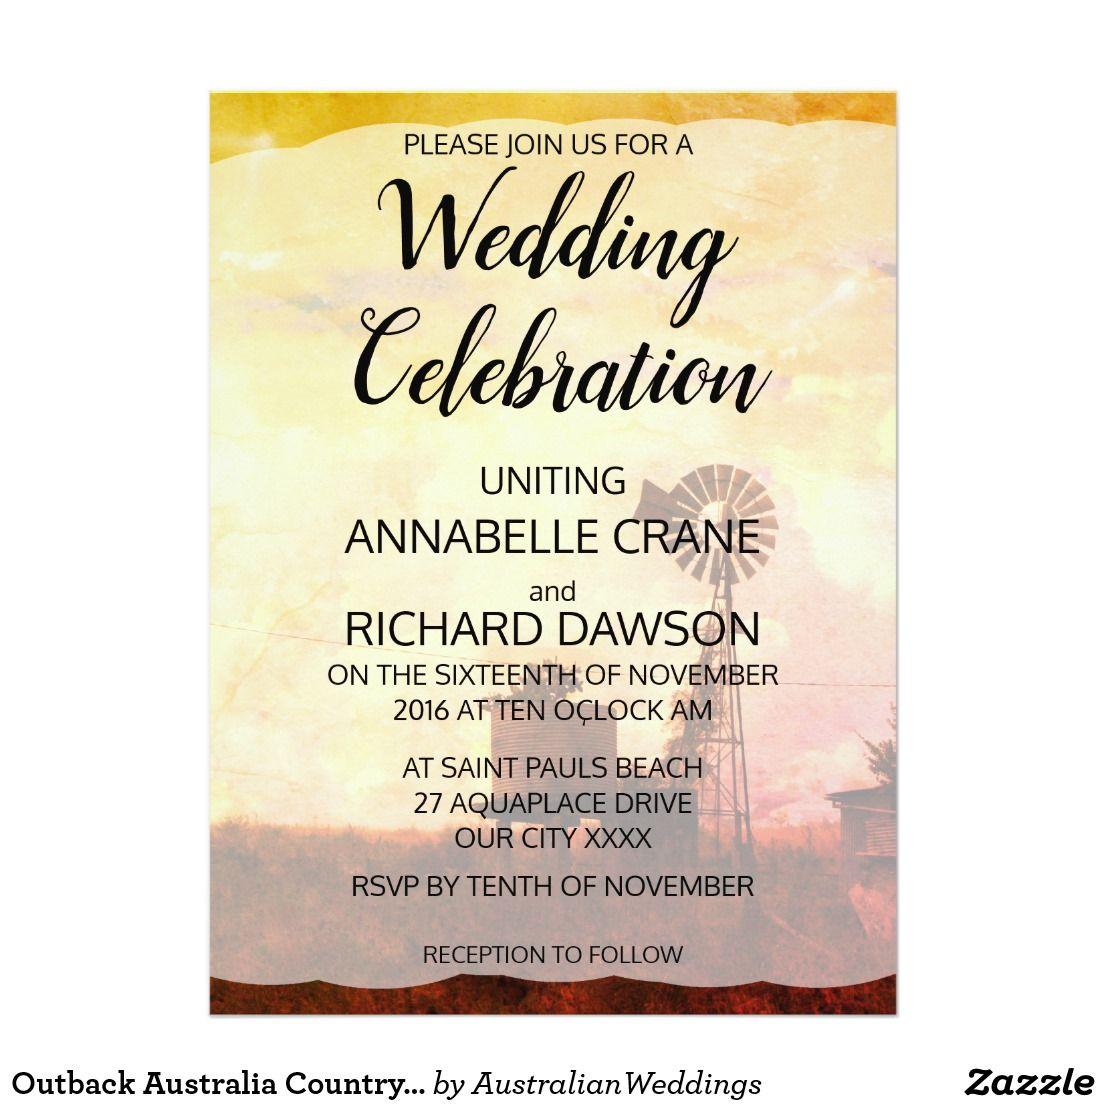 Outback Australia Country Wedding Invitations Zazzle Com